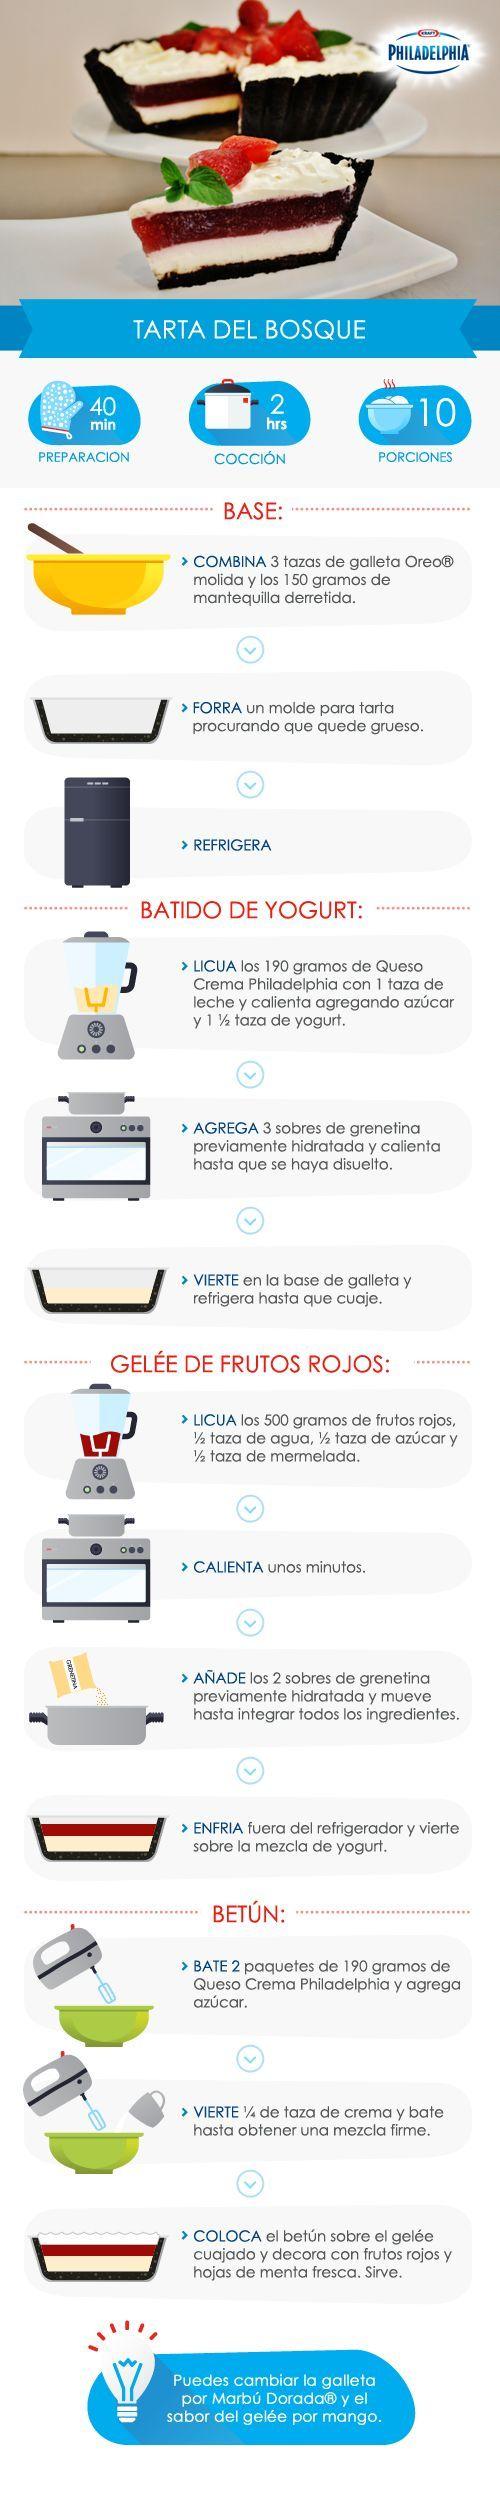 #FestivalDeLaTarta Prepara esta tarta sin usar horno, ¡deliciosa!: